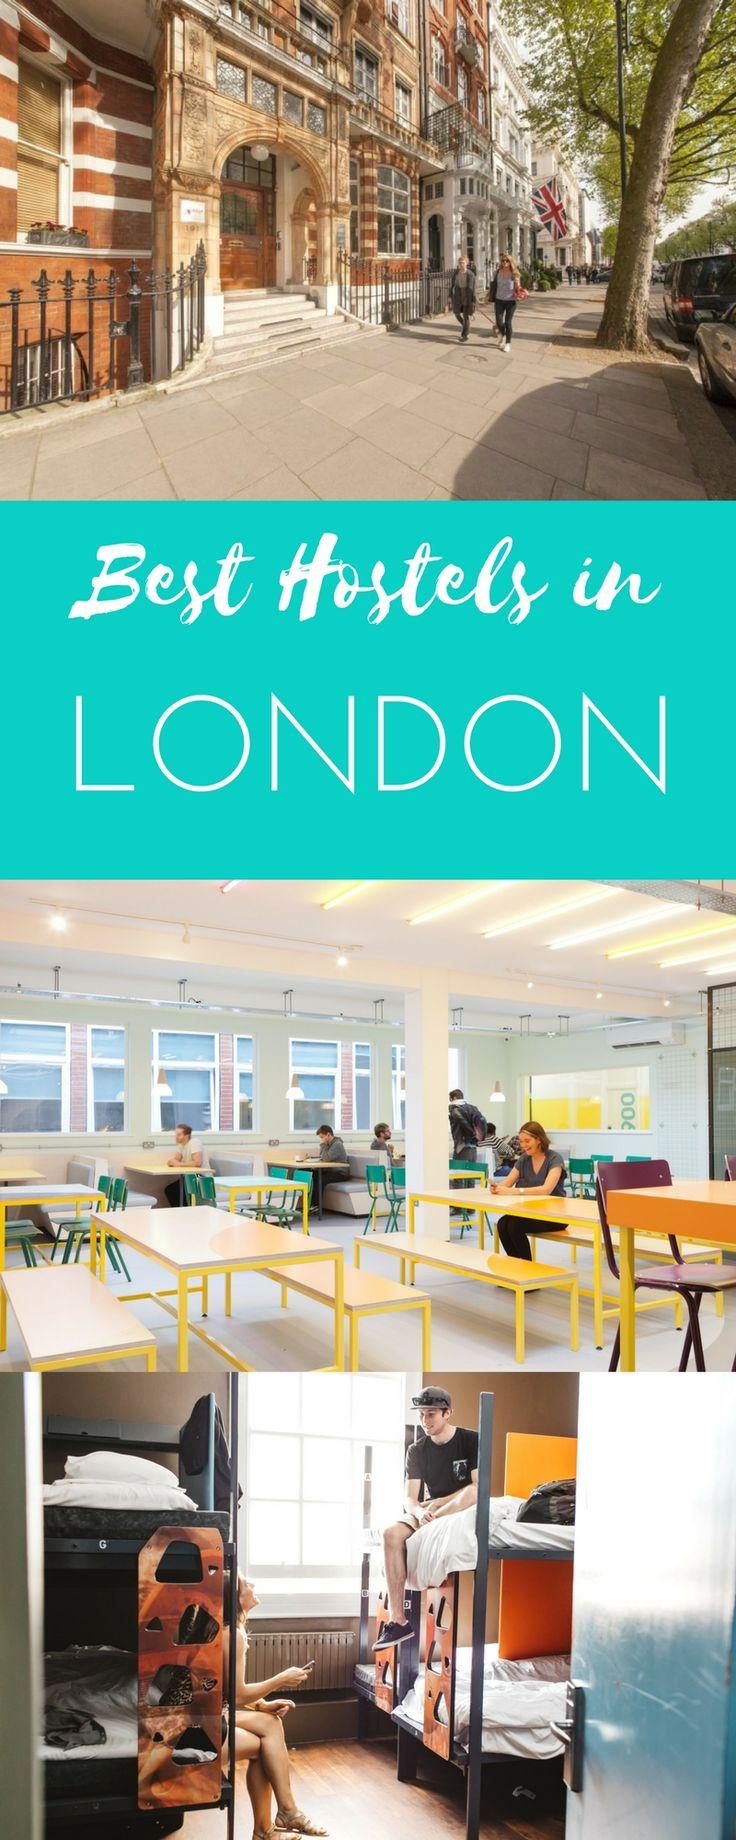 Best 73 Travel in London & UK images on Pinterest | Destinations ...